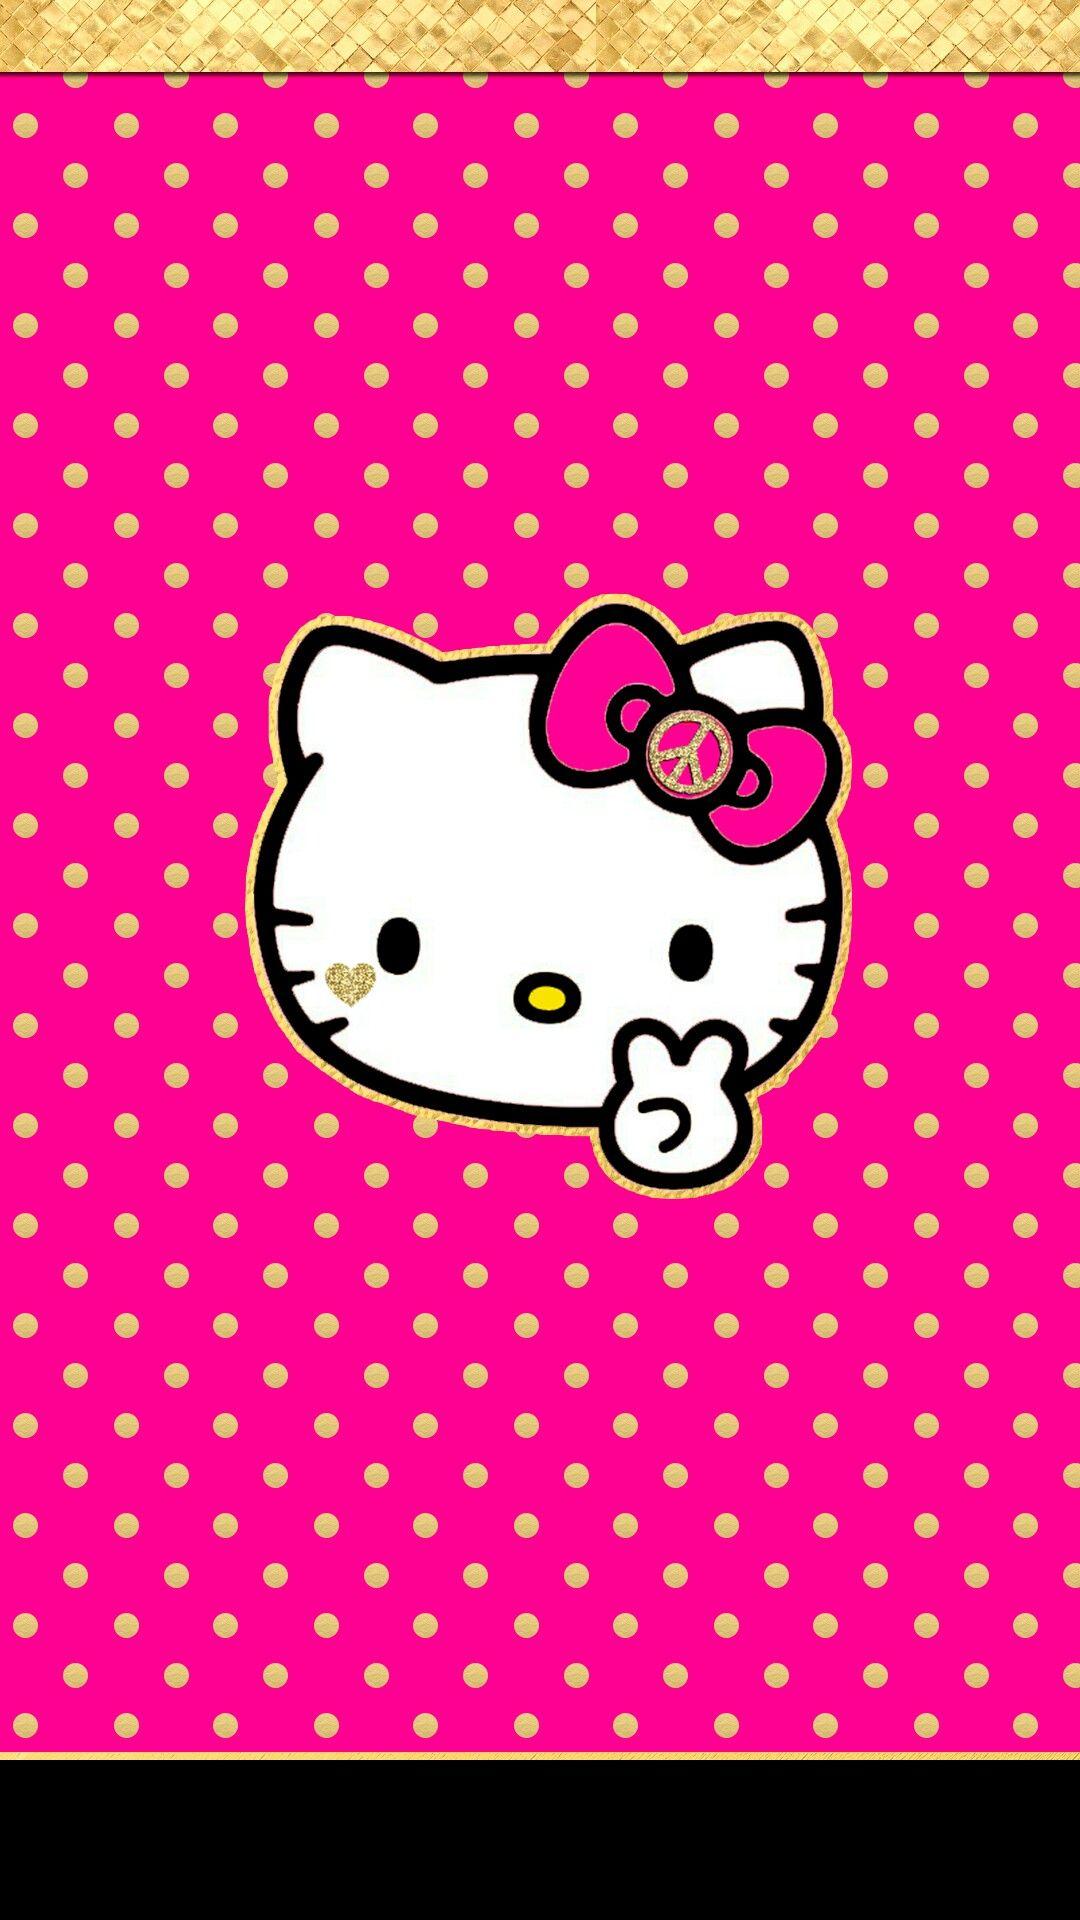 Best Wallpaper Hello Kitty Cute - 89d757ace290dec4ba97cb7891b24669  Pic_238291.jpg